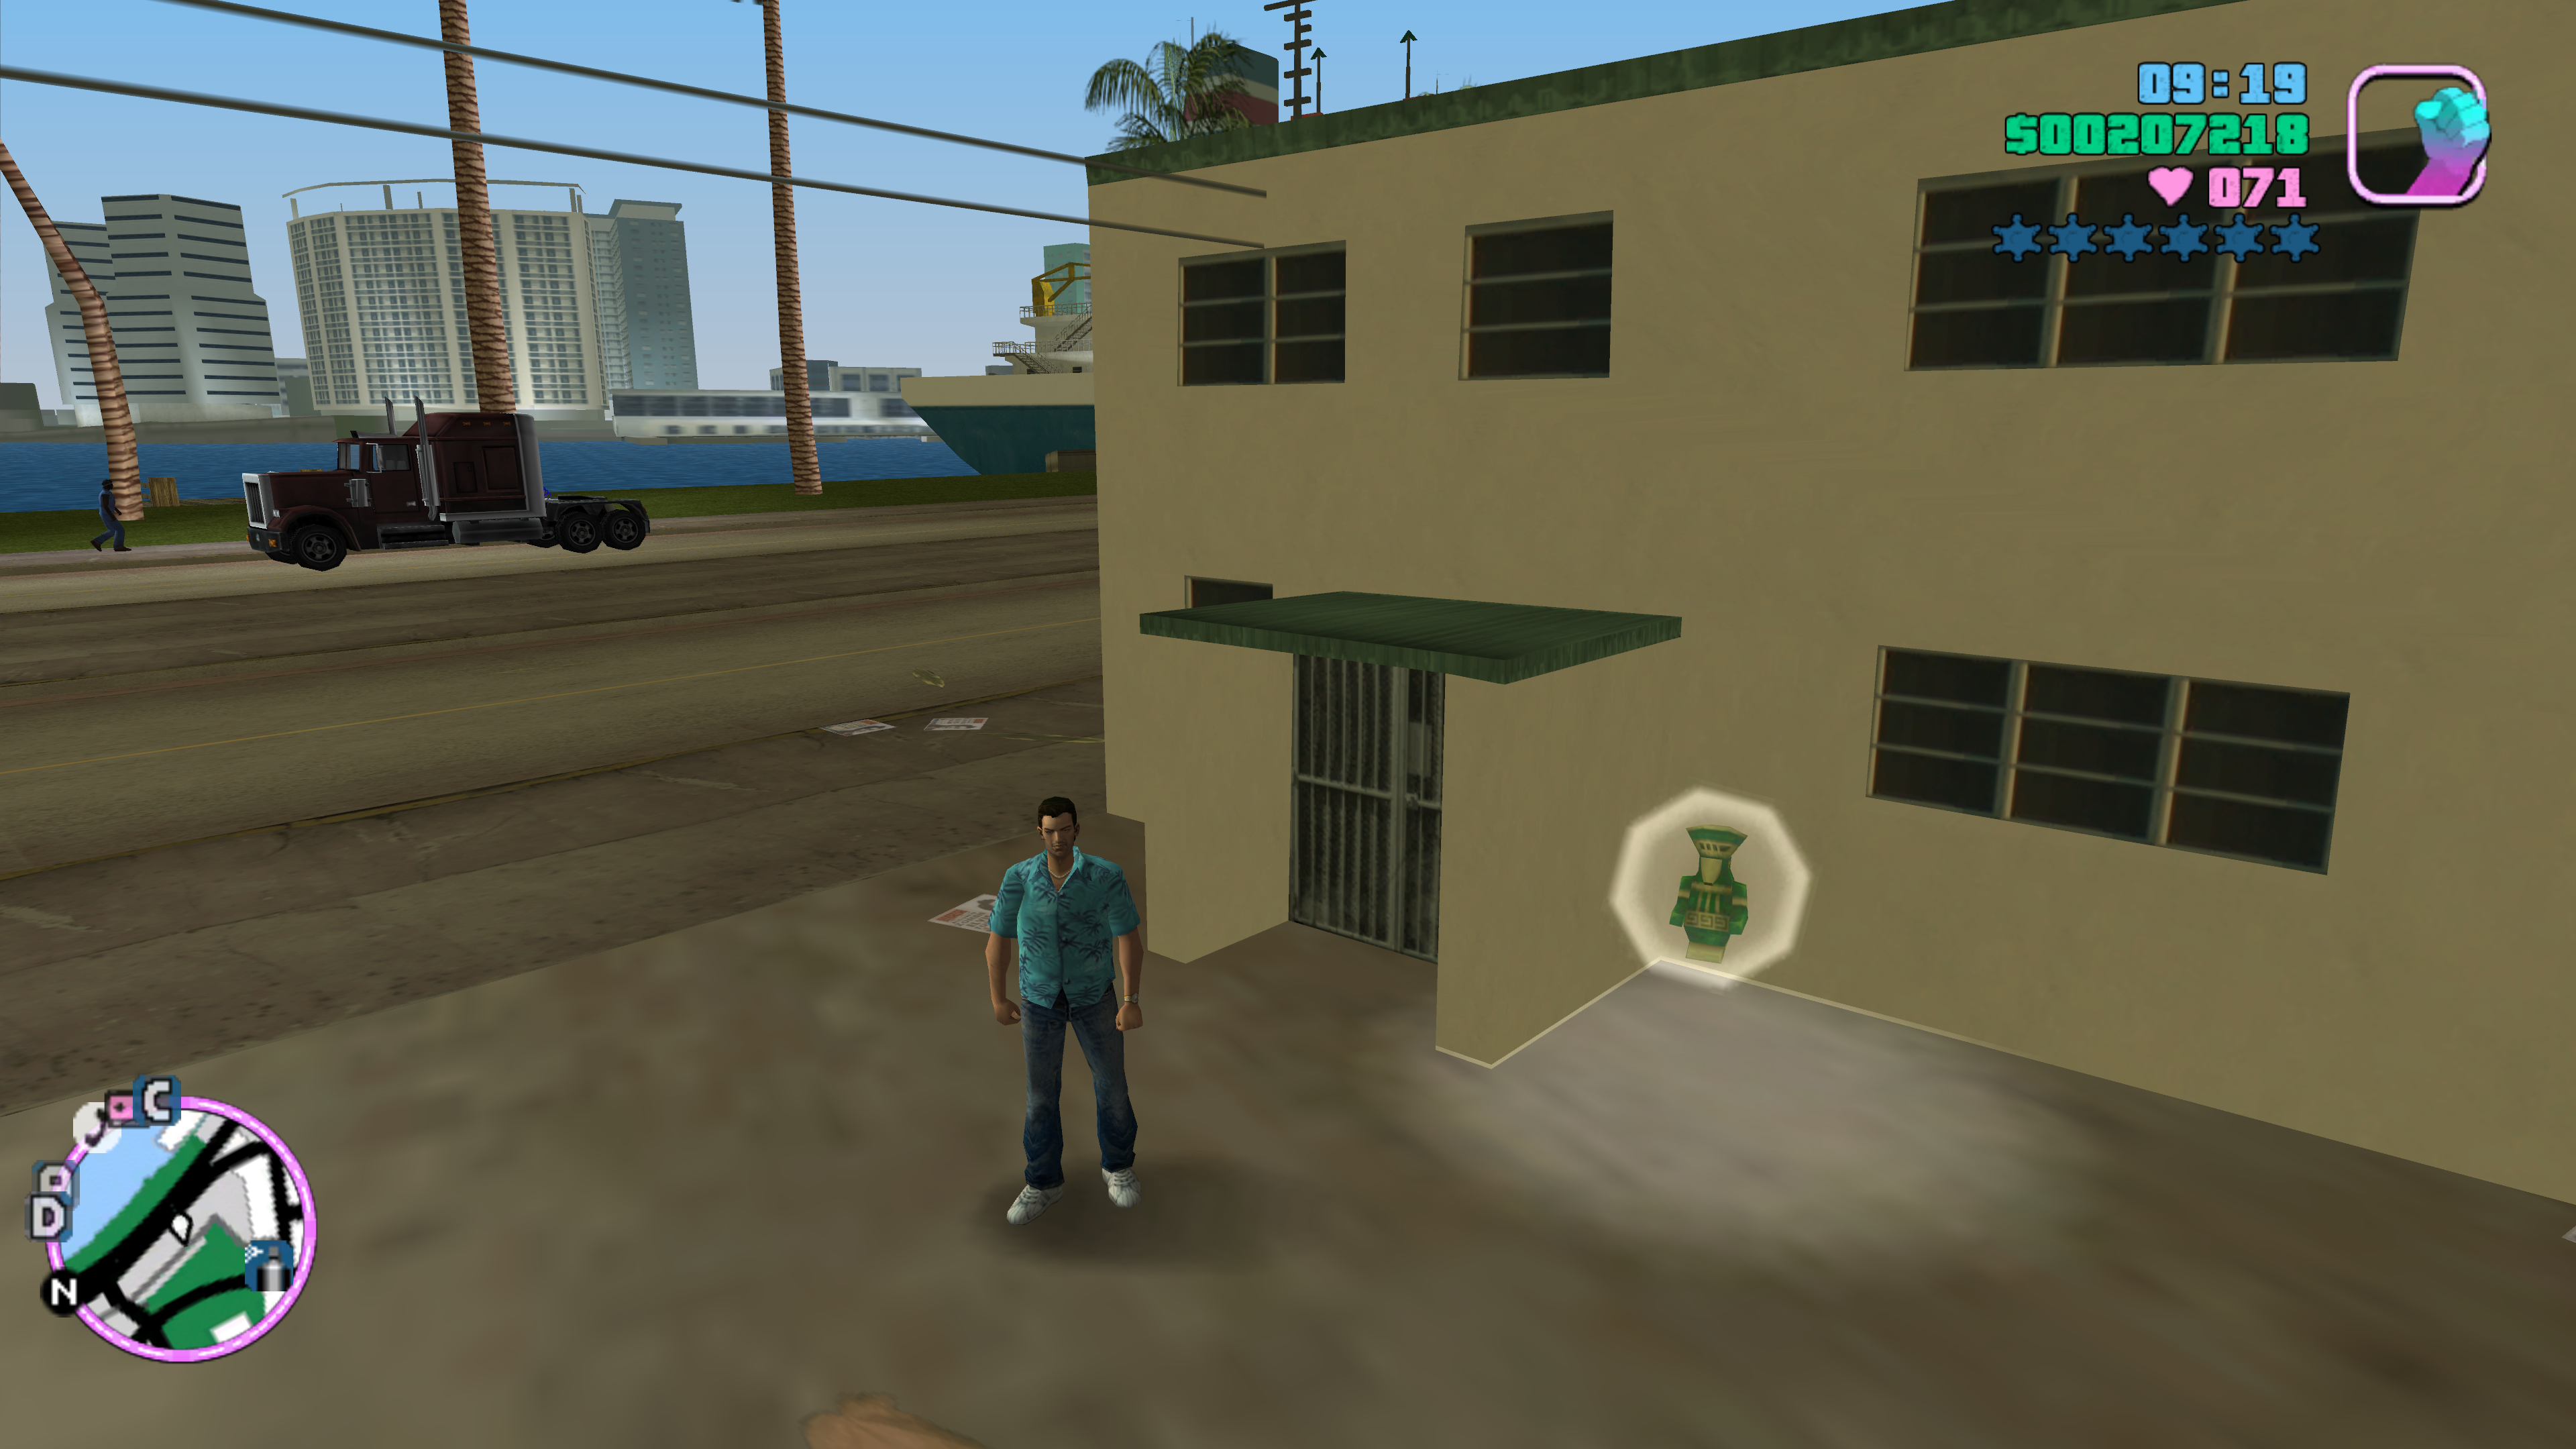 Archivo:GTA VC Objeto Oculto 81.PNG